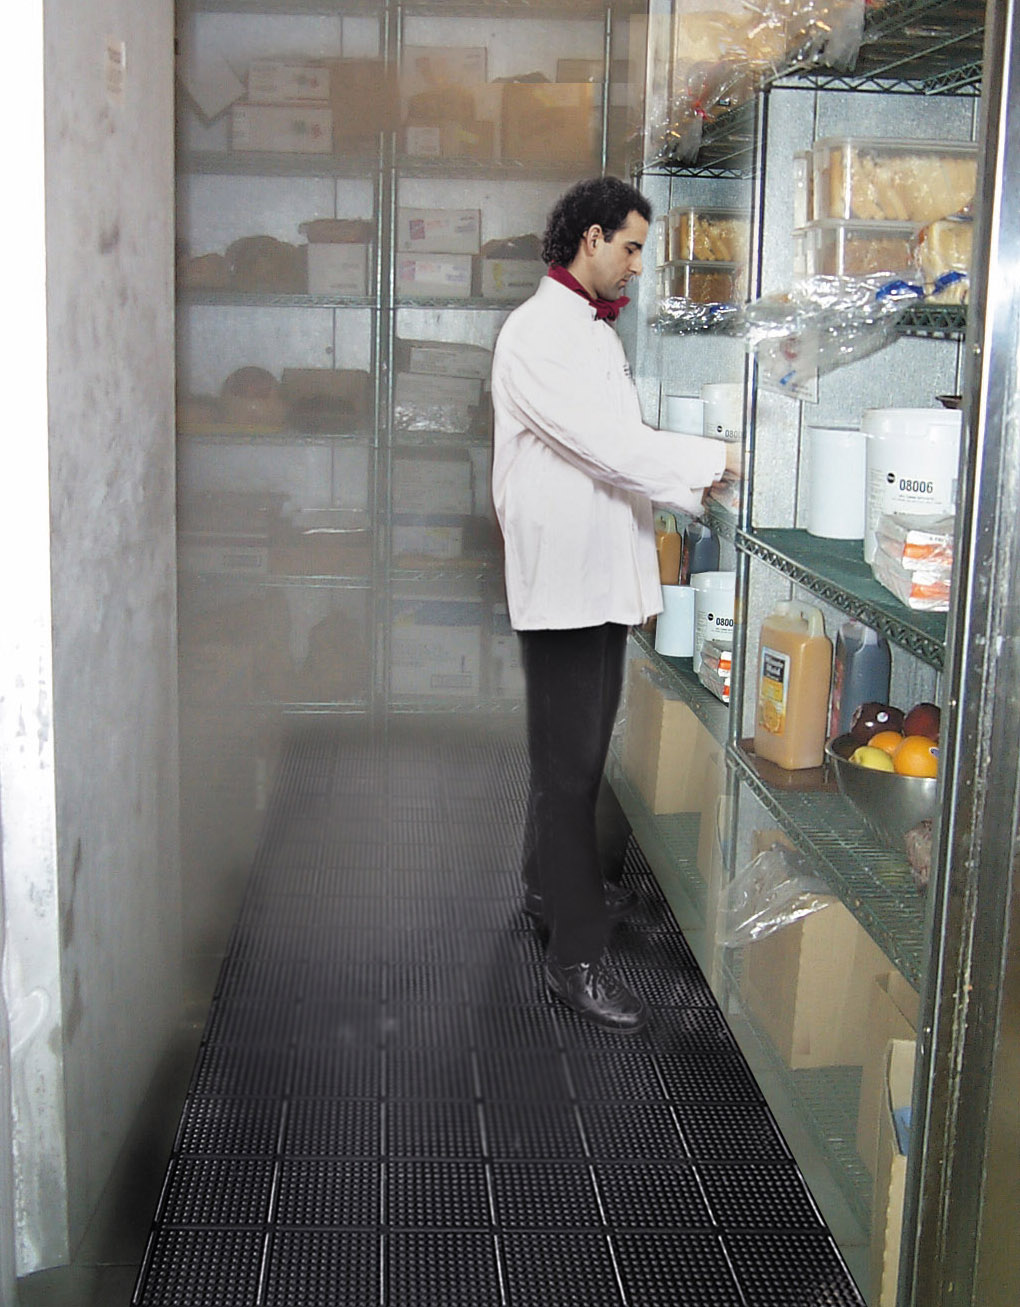 sub zero walk-in freezer mats are rubber kitchen matsfloormats